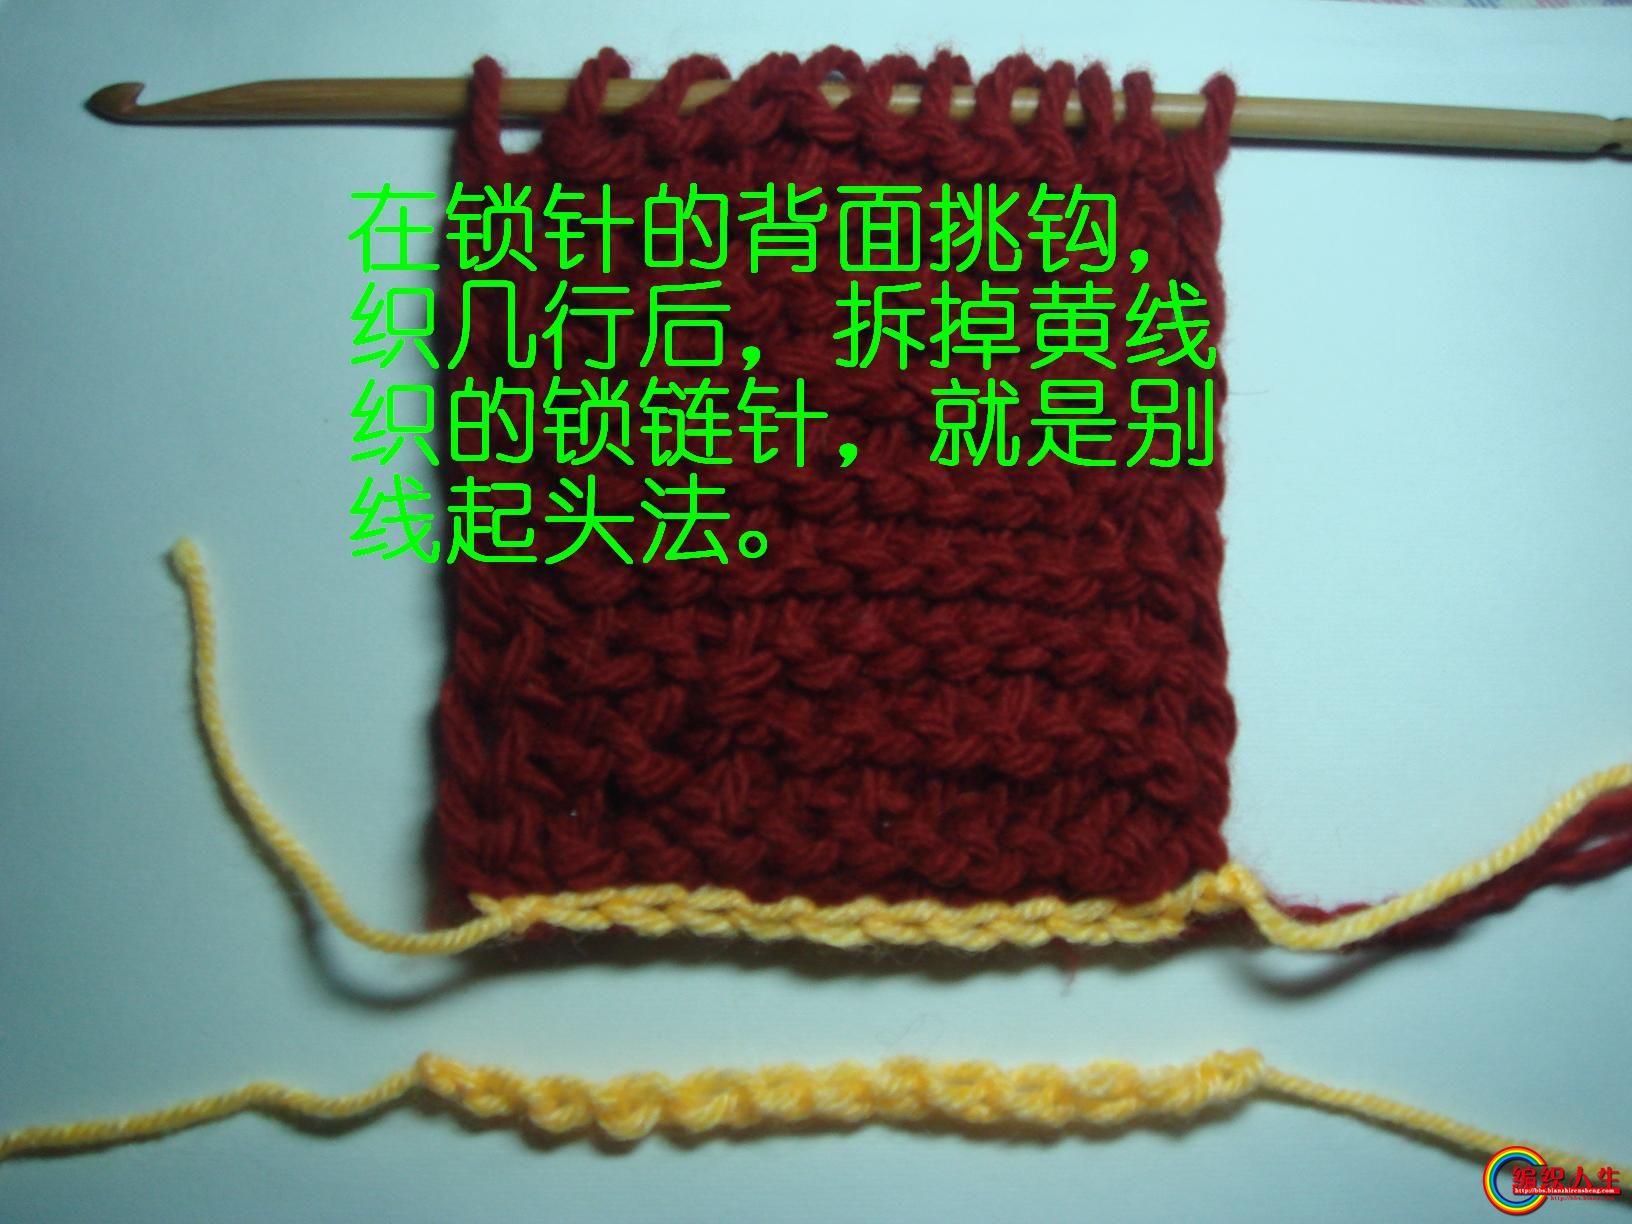 DSC09385.JPG